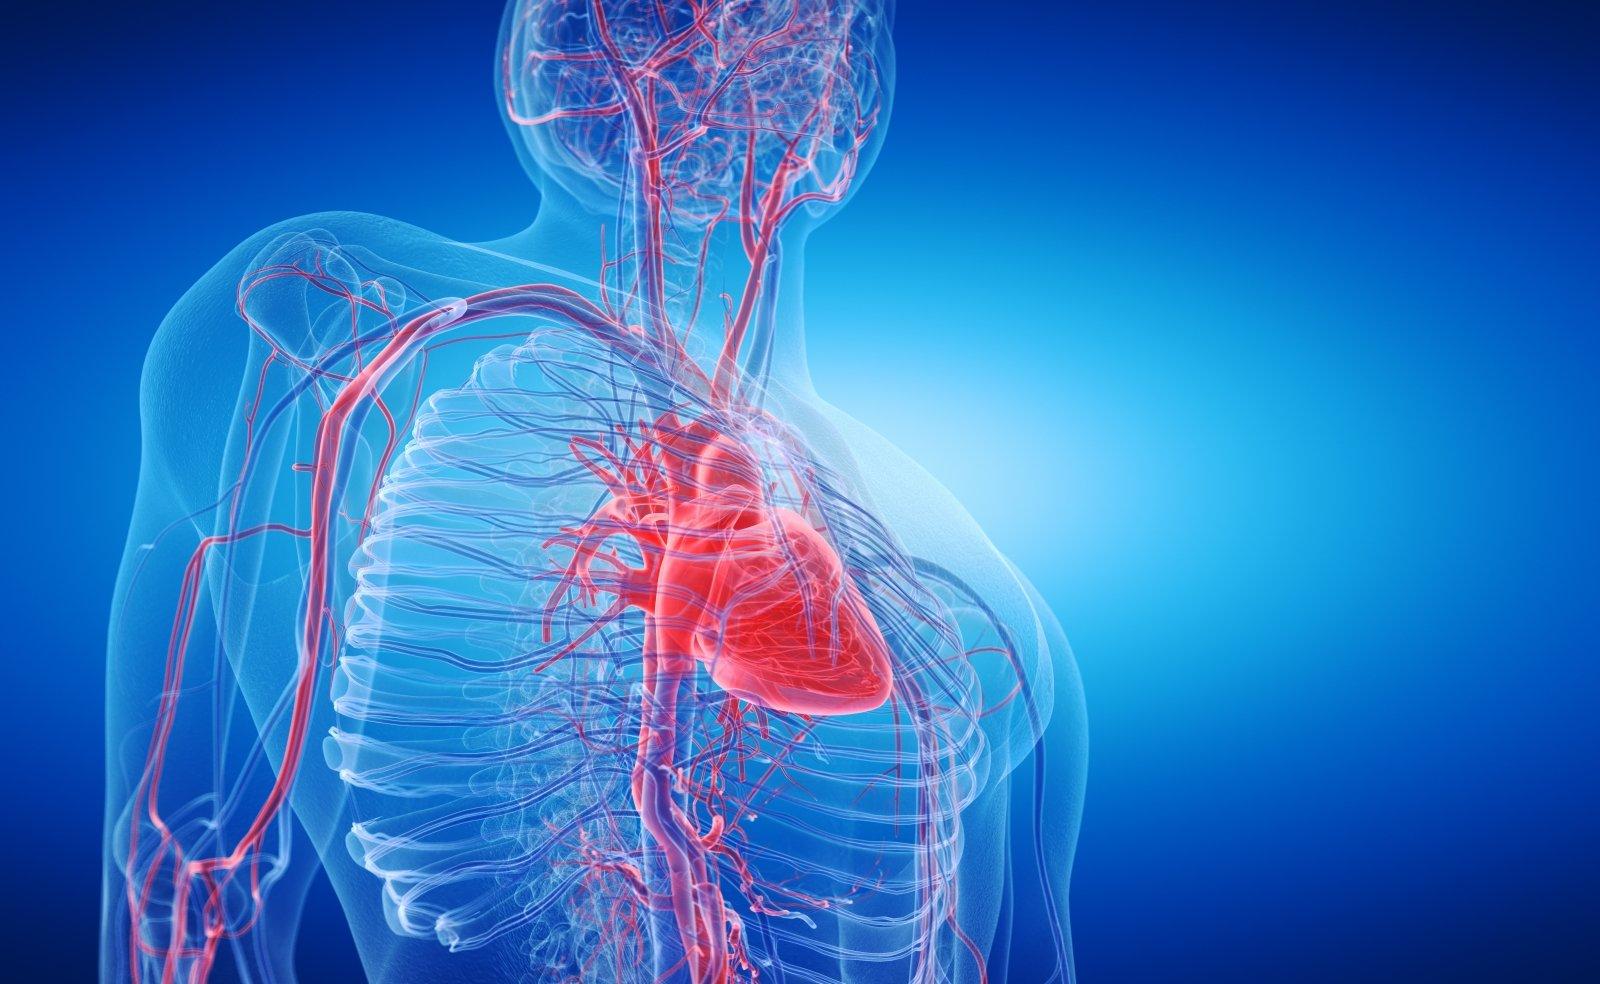 hipertenzija ir neryškus matymas simpatinė hipertenzija